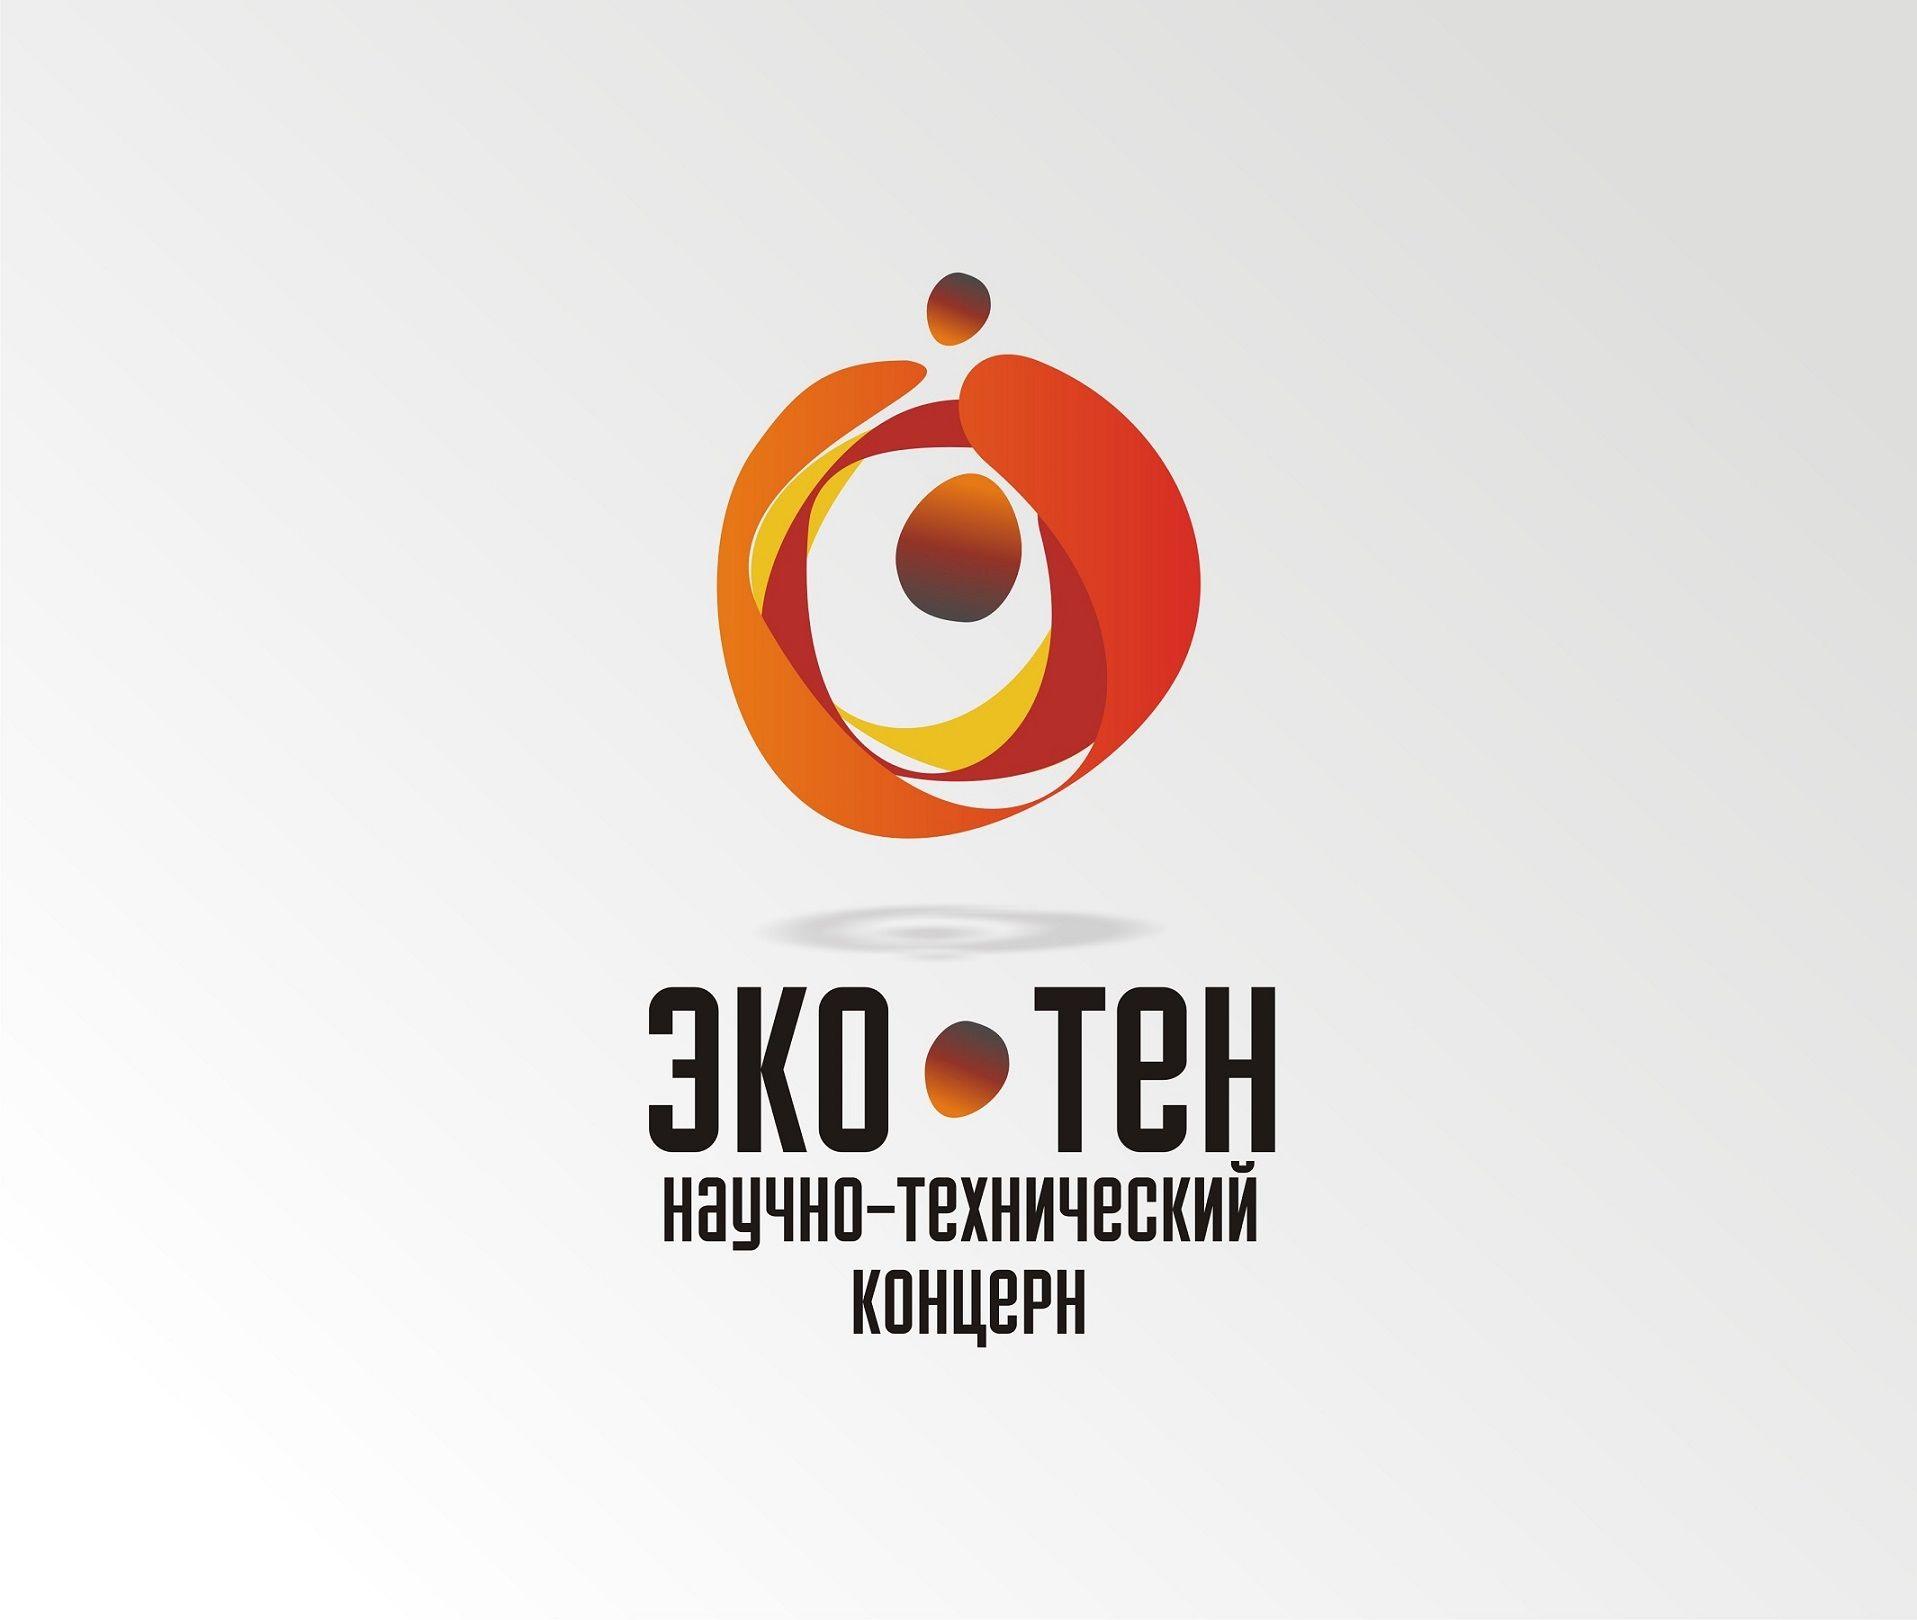 Логотип для научно - технического концерна - дизайнер ollinor